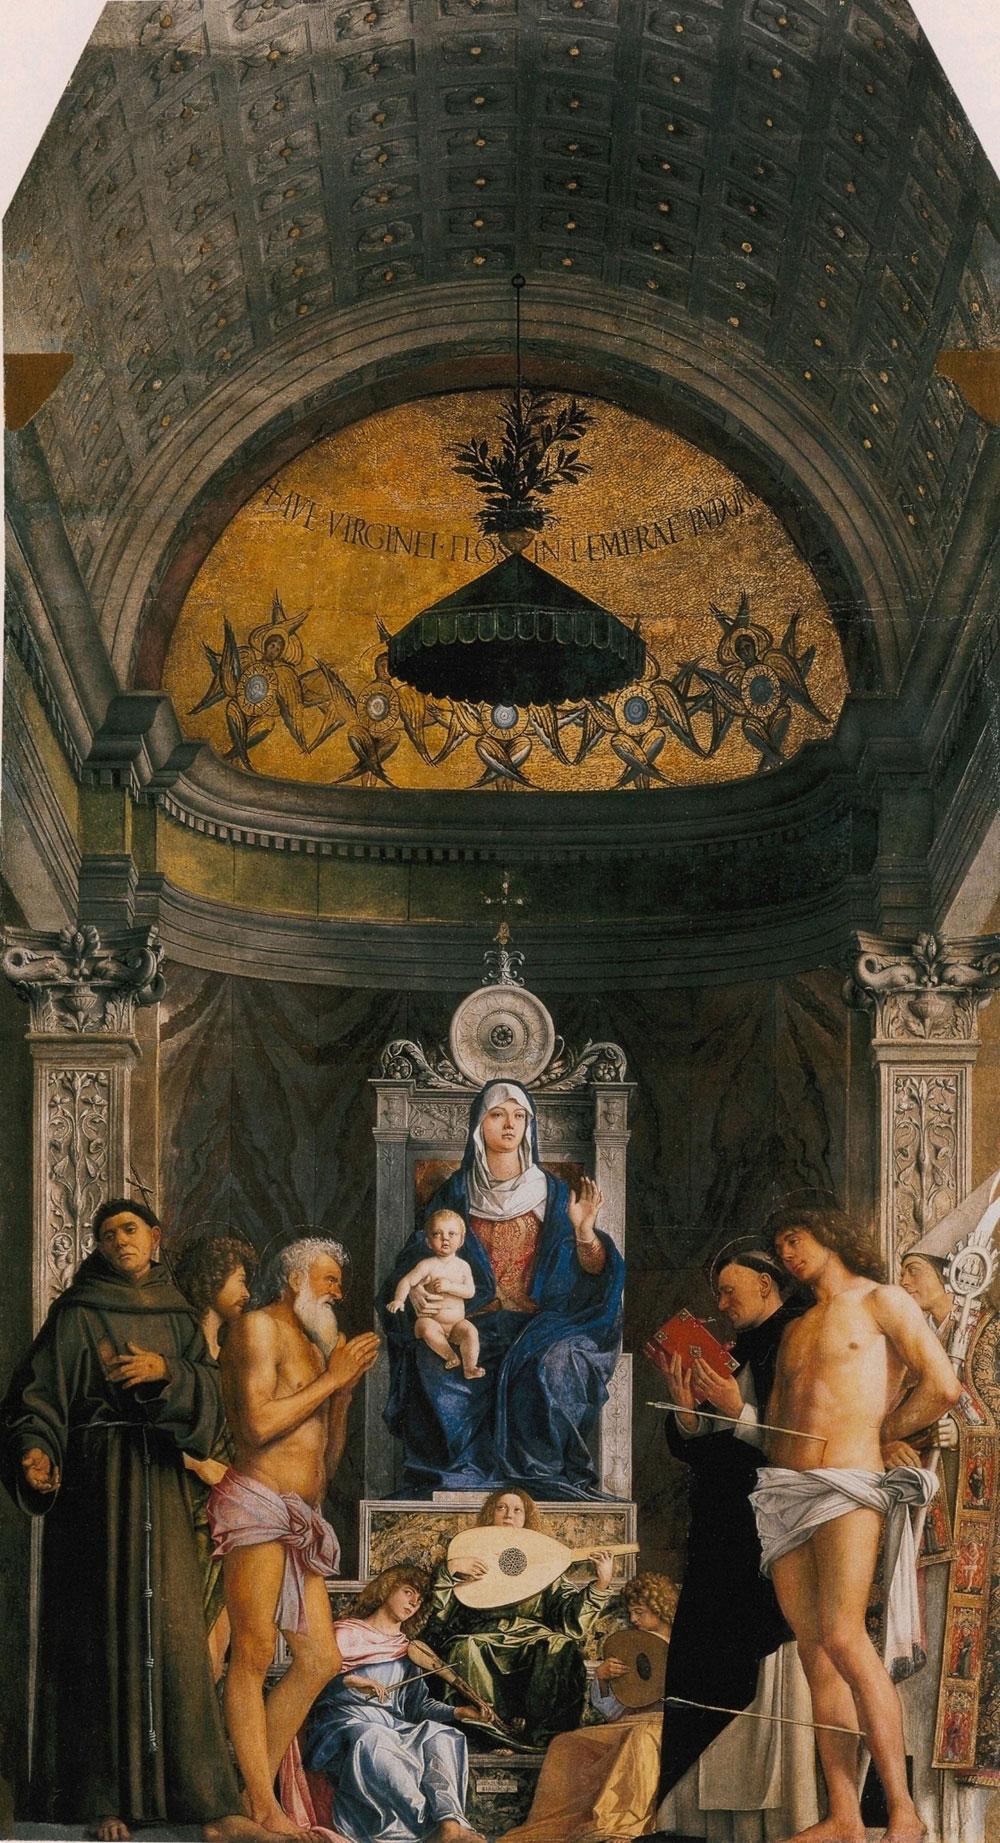 San Giobbe Altarpiece by Giovanni Bellini